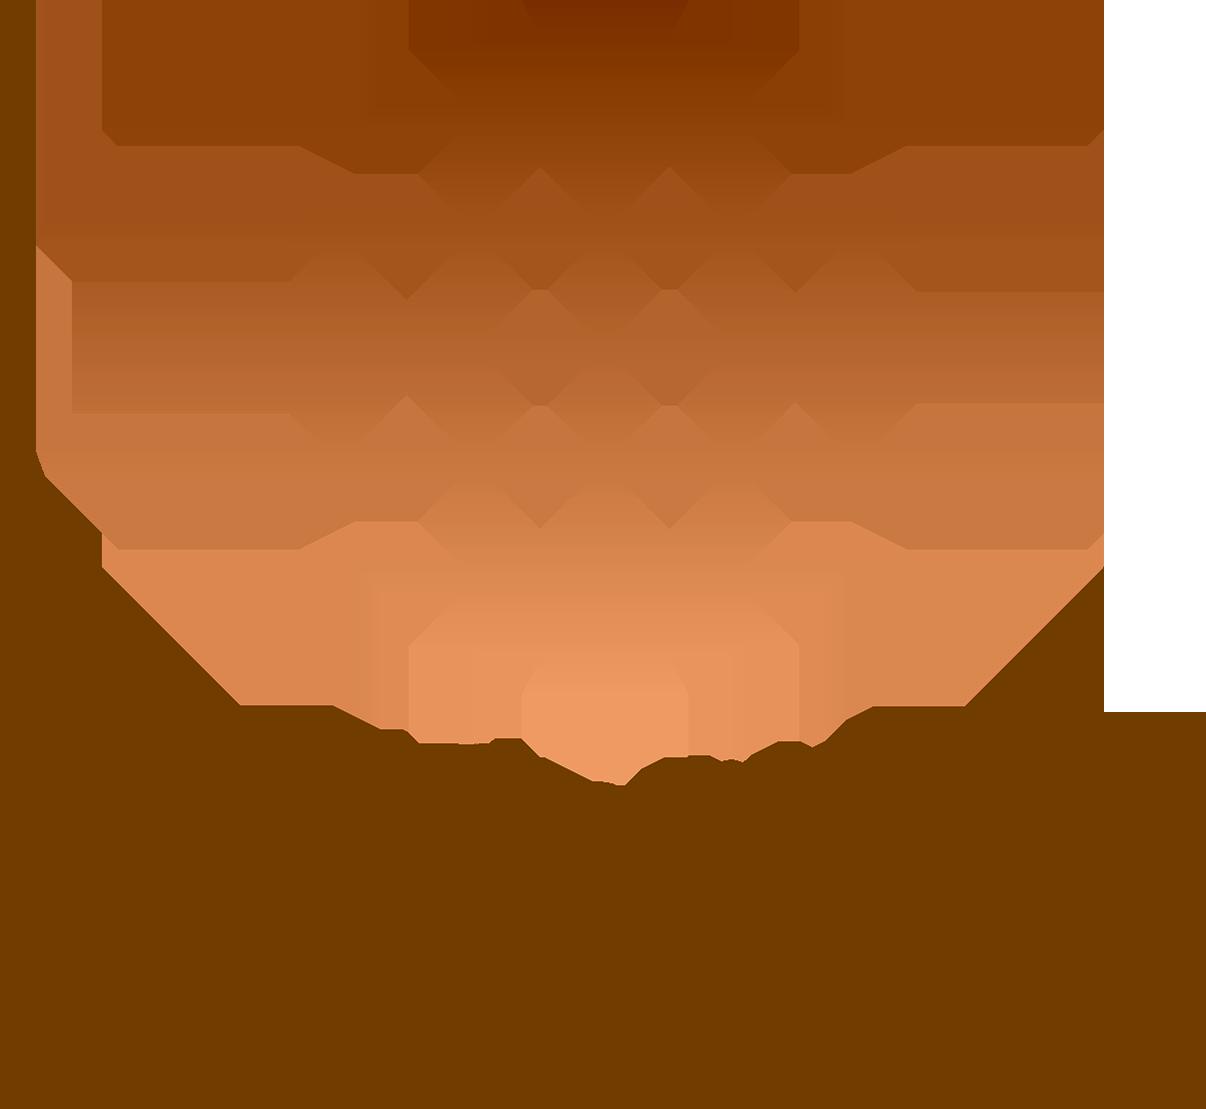 Fórum 2020